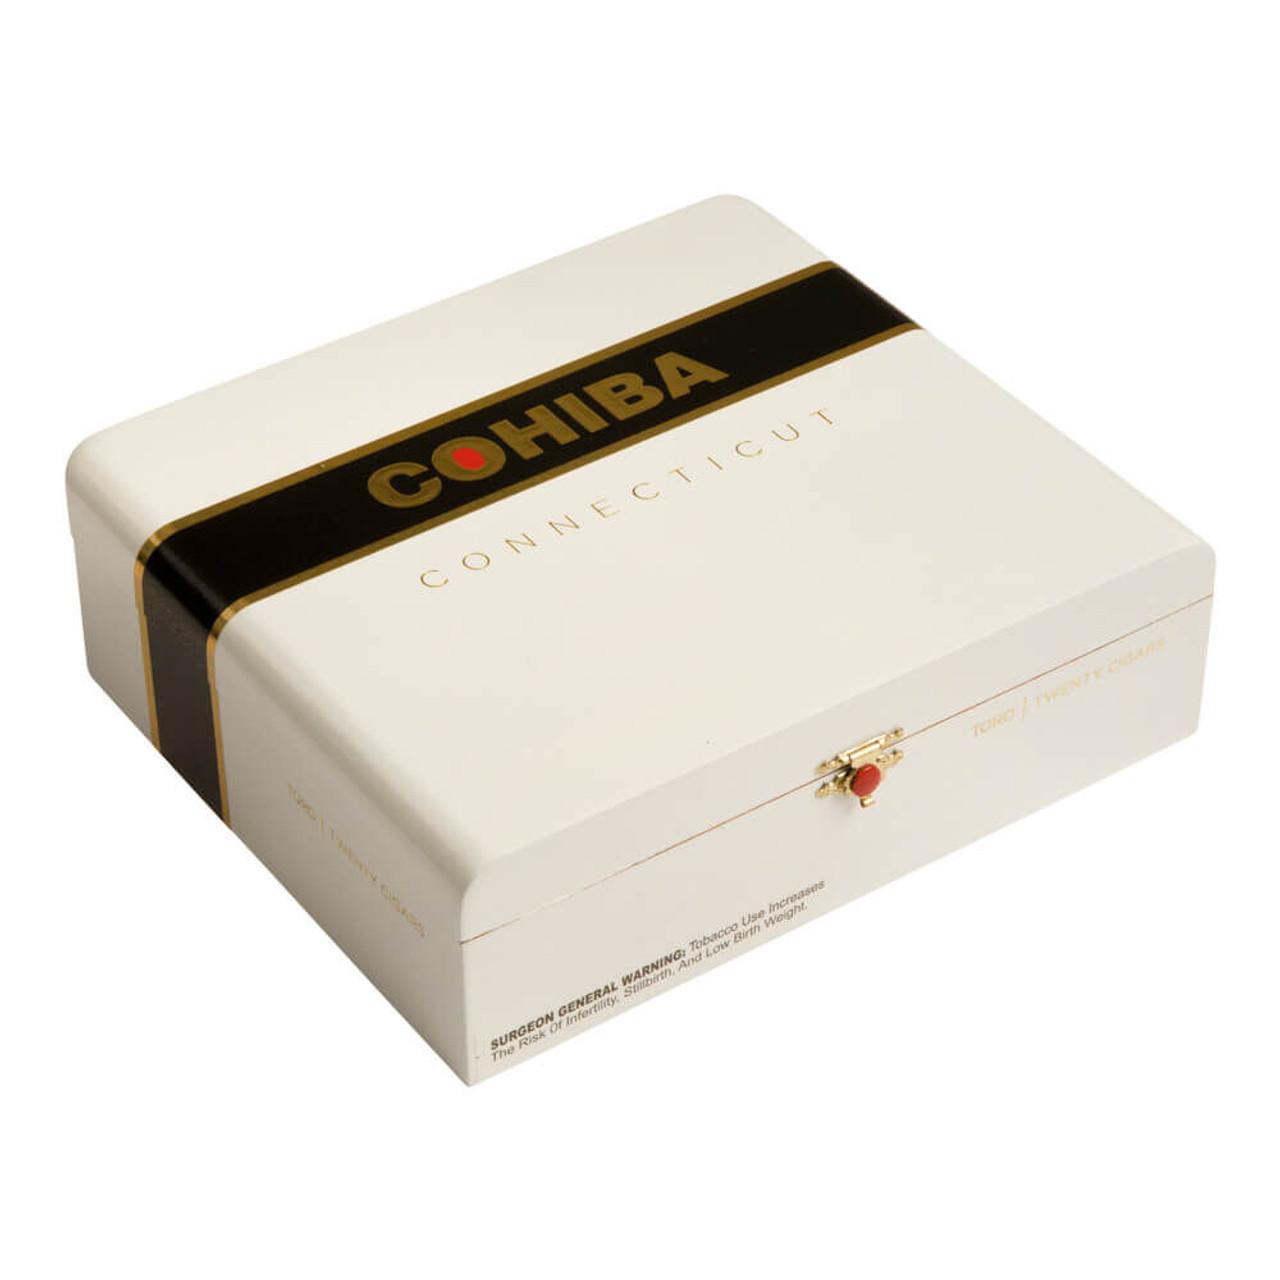 Cohiba Connecticut Toro Cigars - 6.5 x 52 (Box of 20)